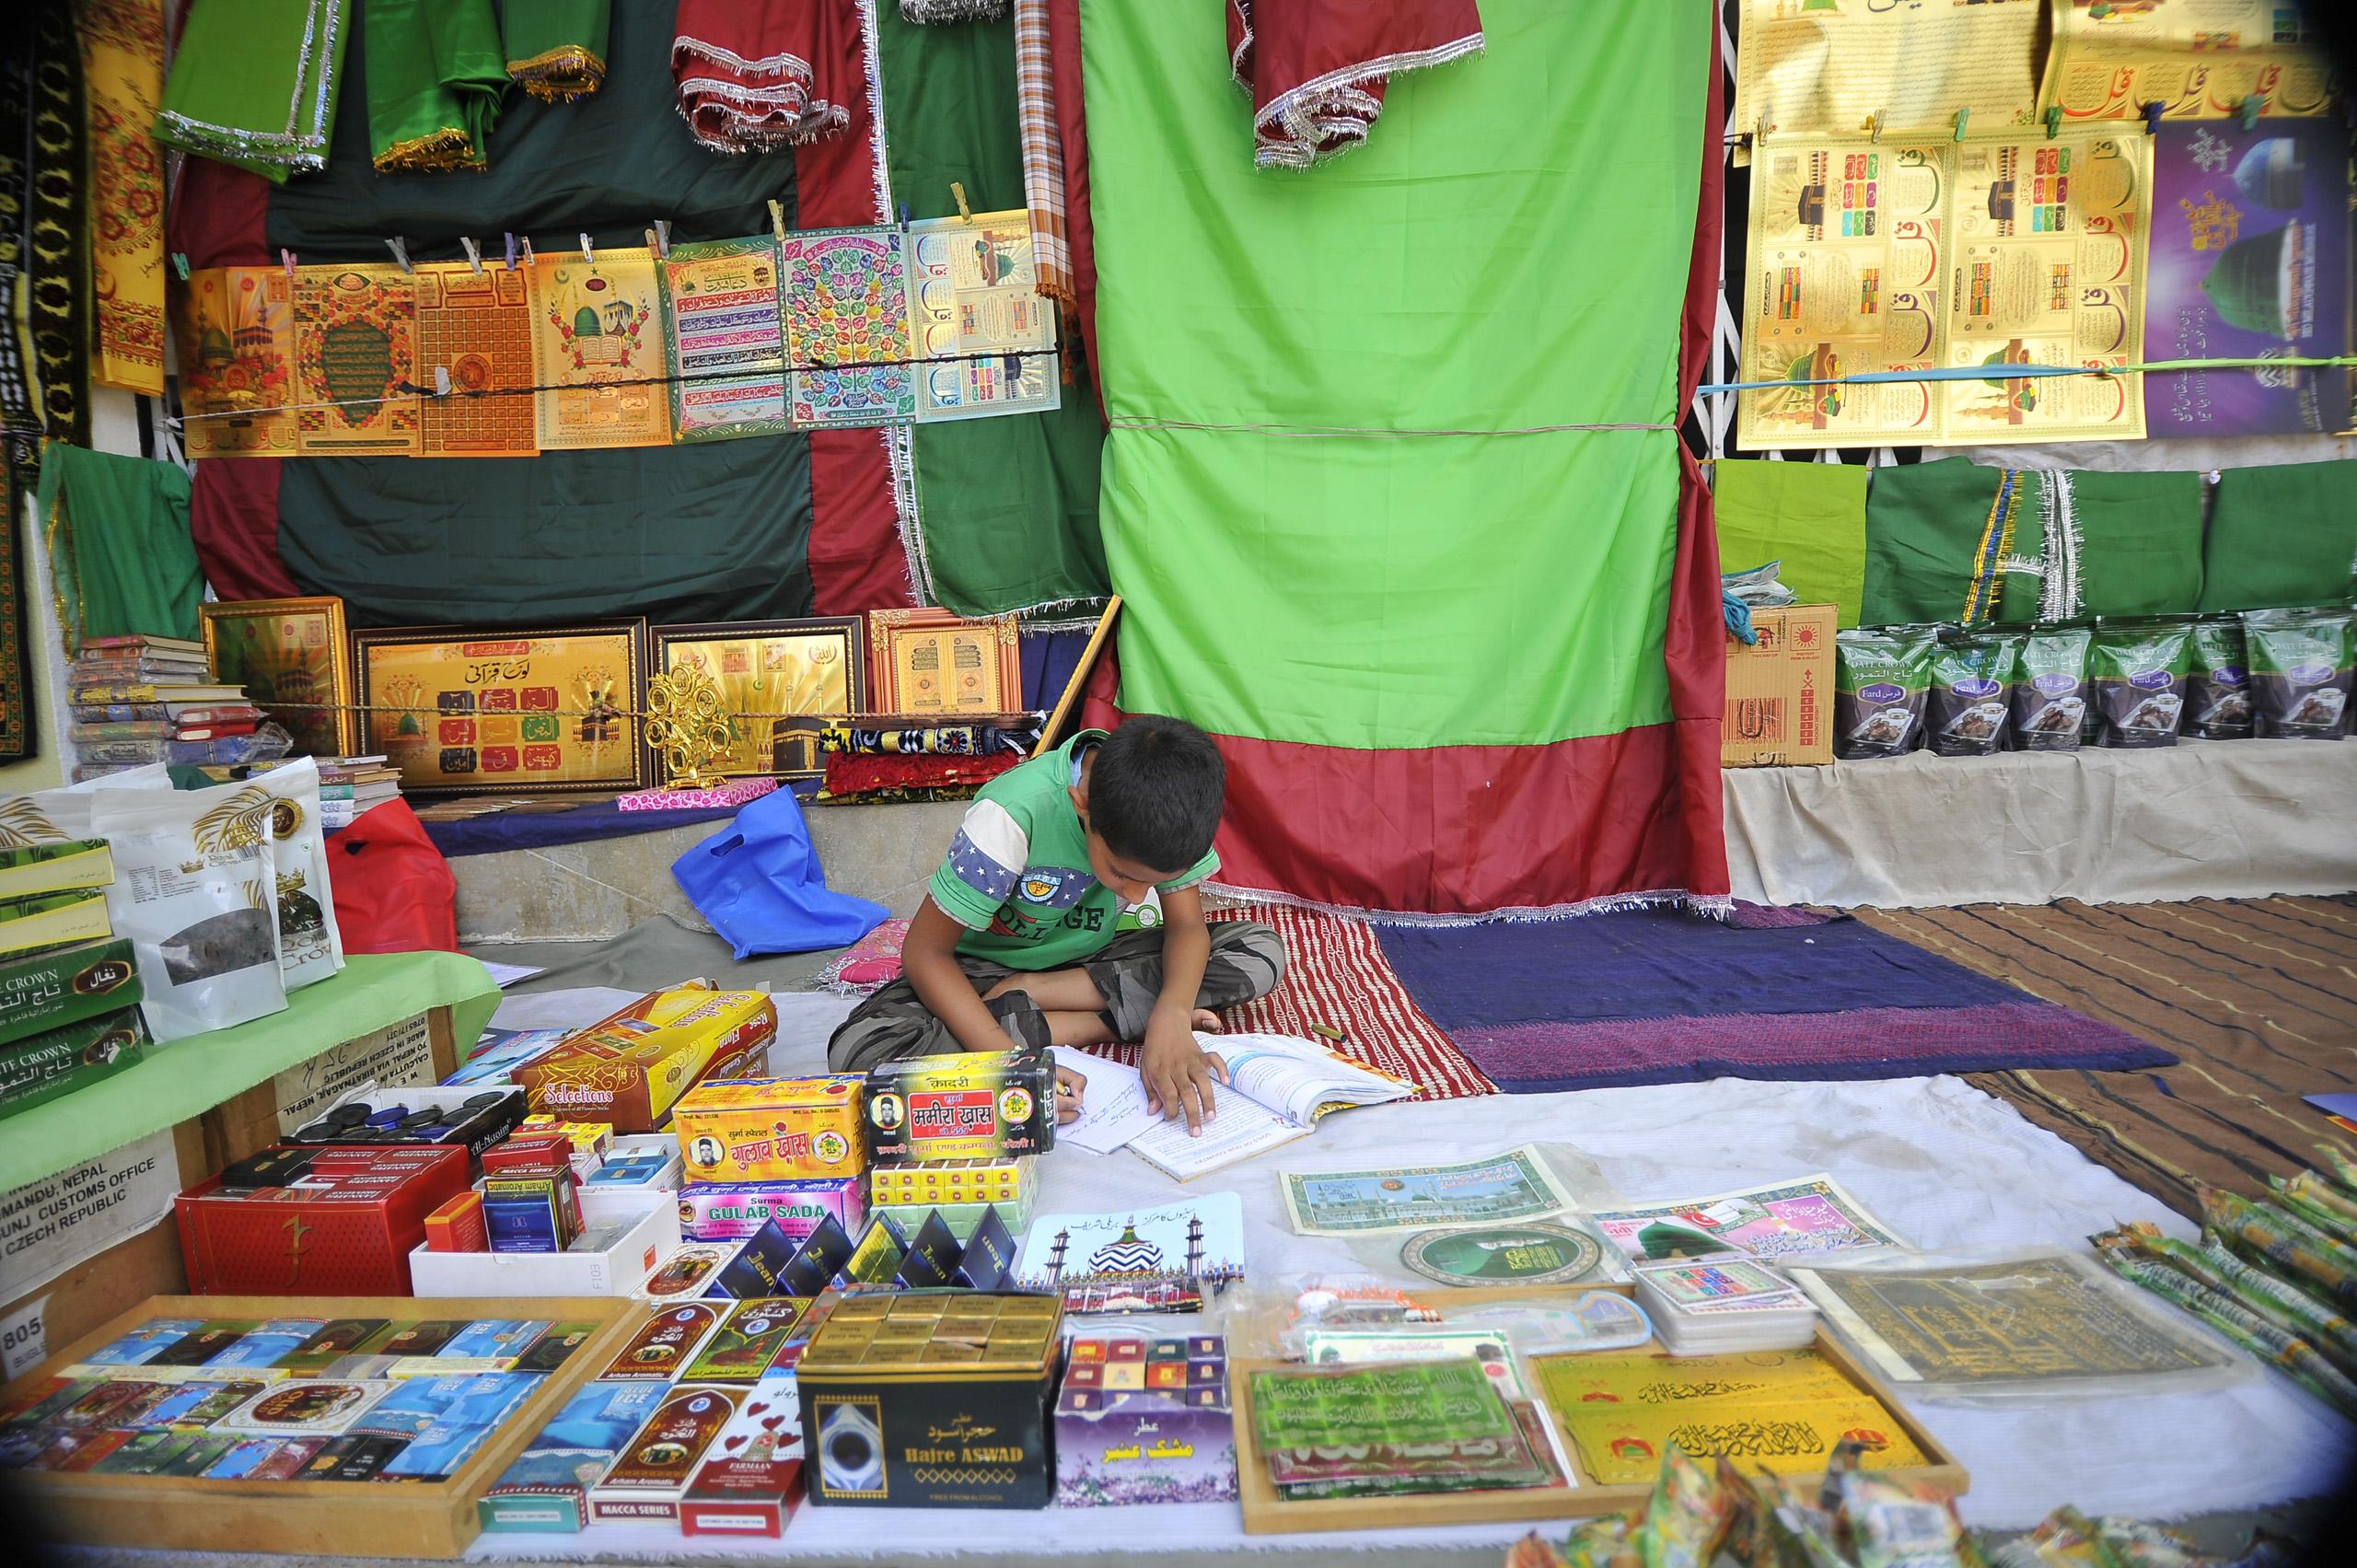 Ghulam Raza, 11, does homework at the Ramadan Market of his father at Kashmiri Takiya Jame mosque at Kathmandu, Nepal, on June 9, 2016.